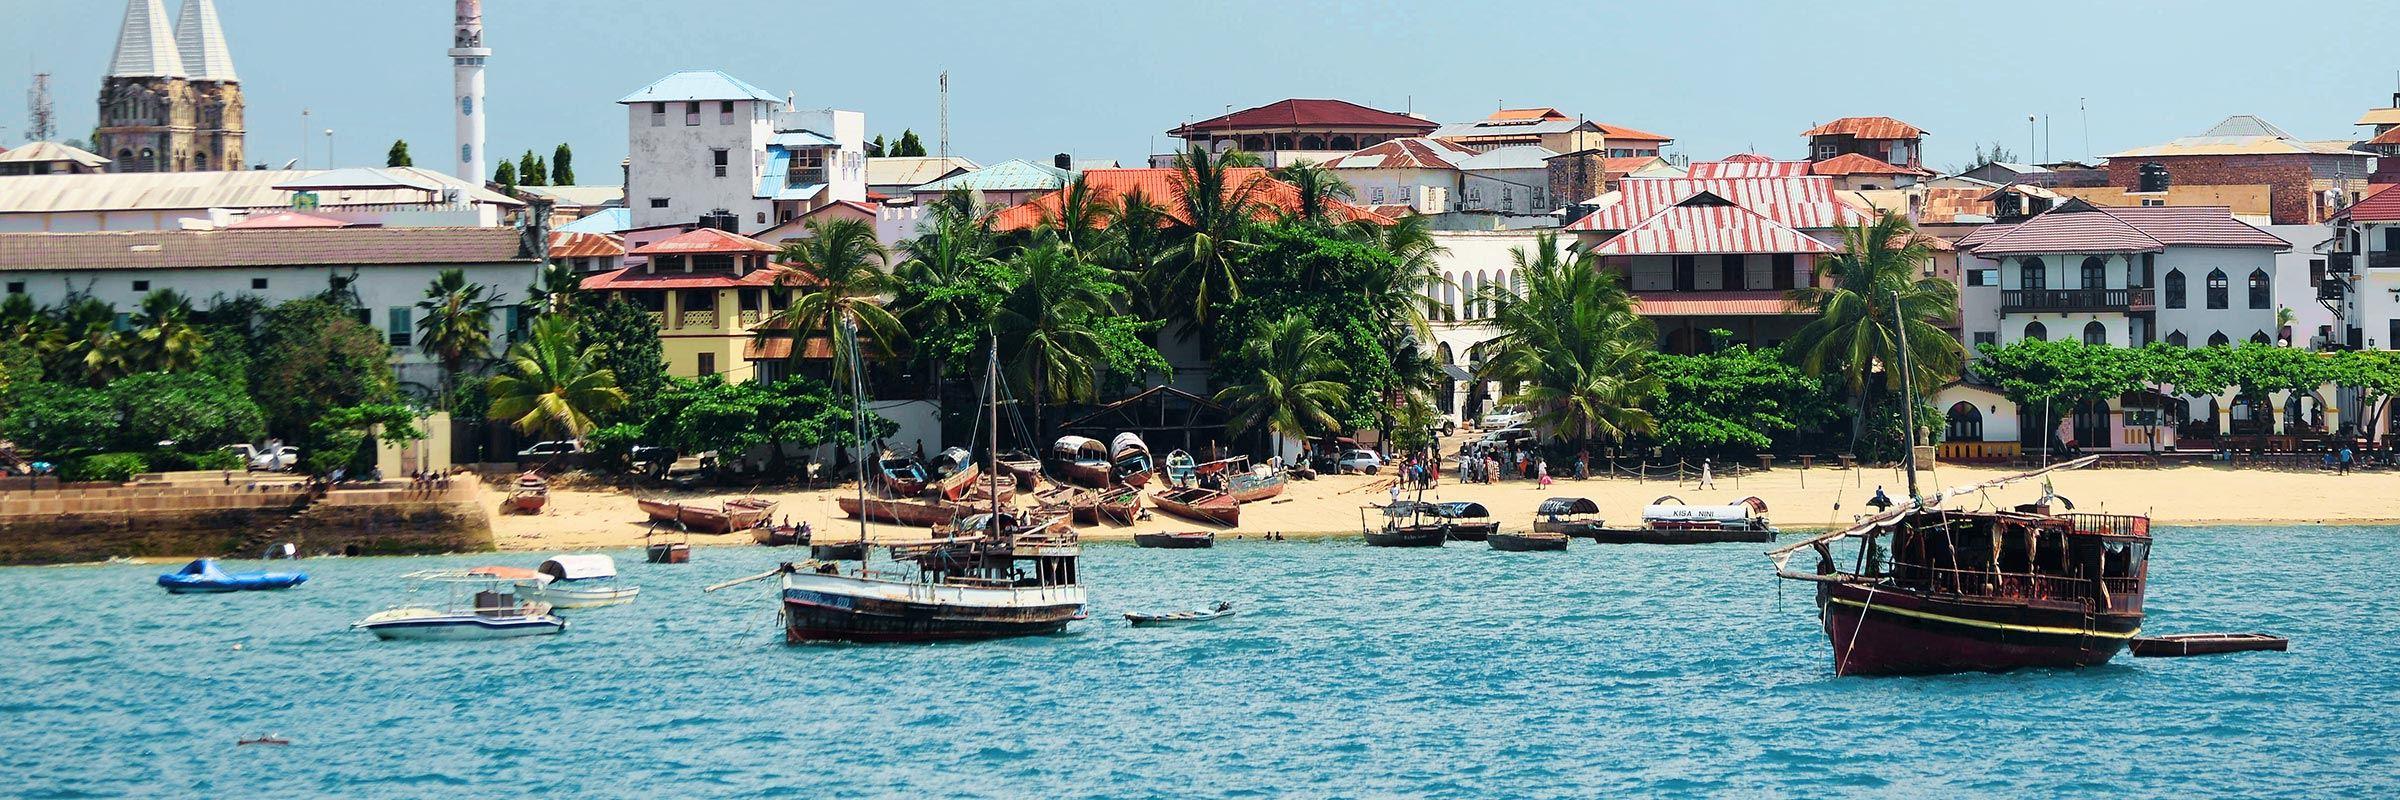 Visit Zanzibar Island, Zanzibar Archipelago | Audley Travel